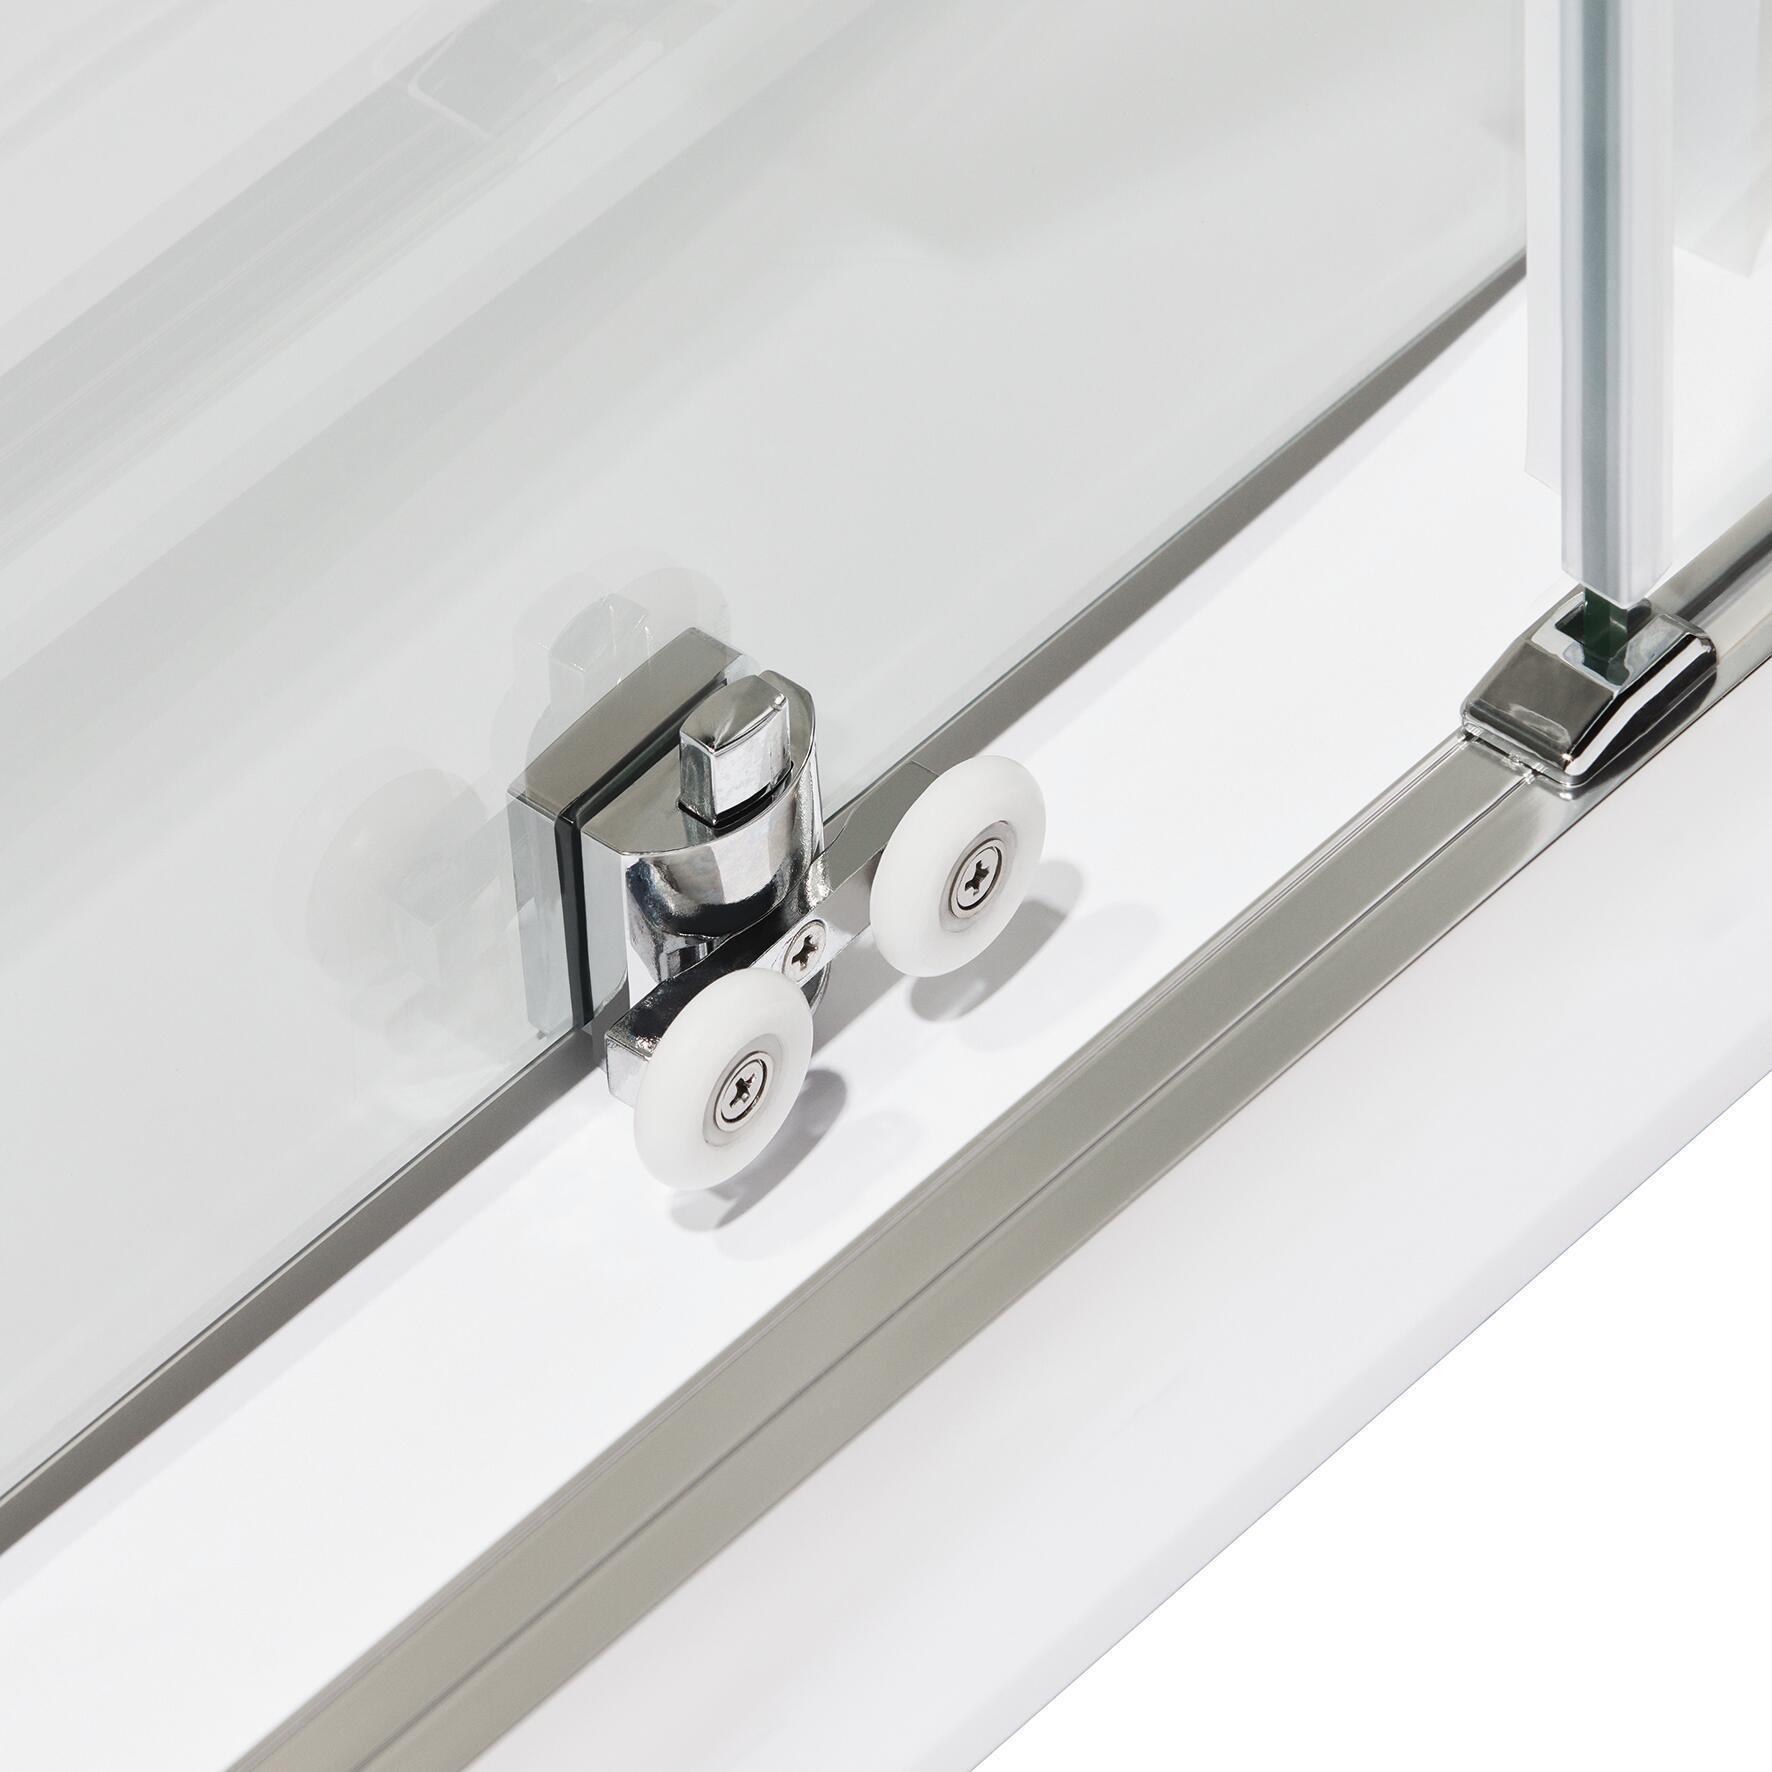 Porta doccia scorrevole Quad 100 cm, H 190 cm in vetro, spessore 6 mm trasparente satinato - 2